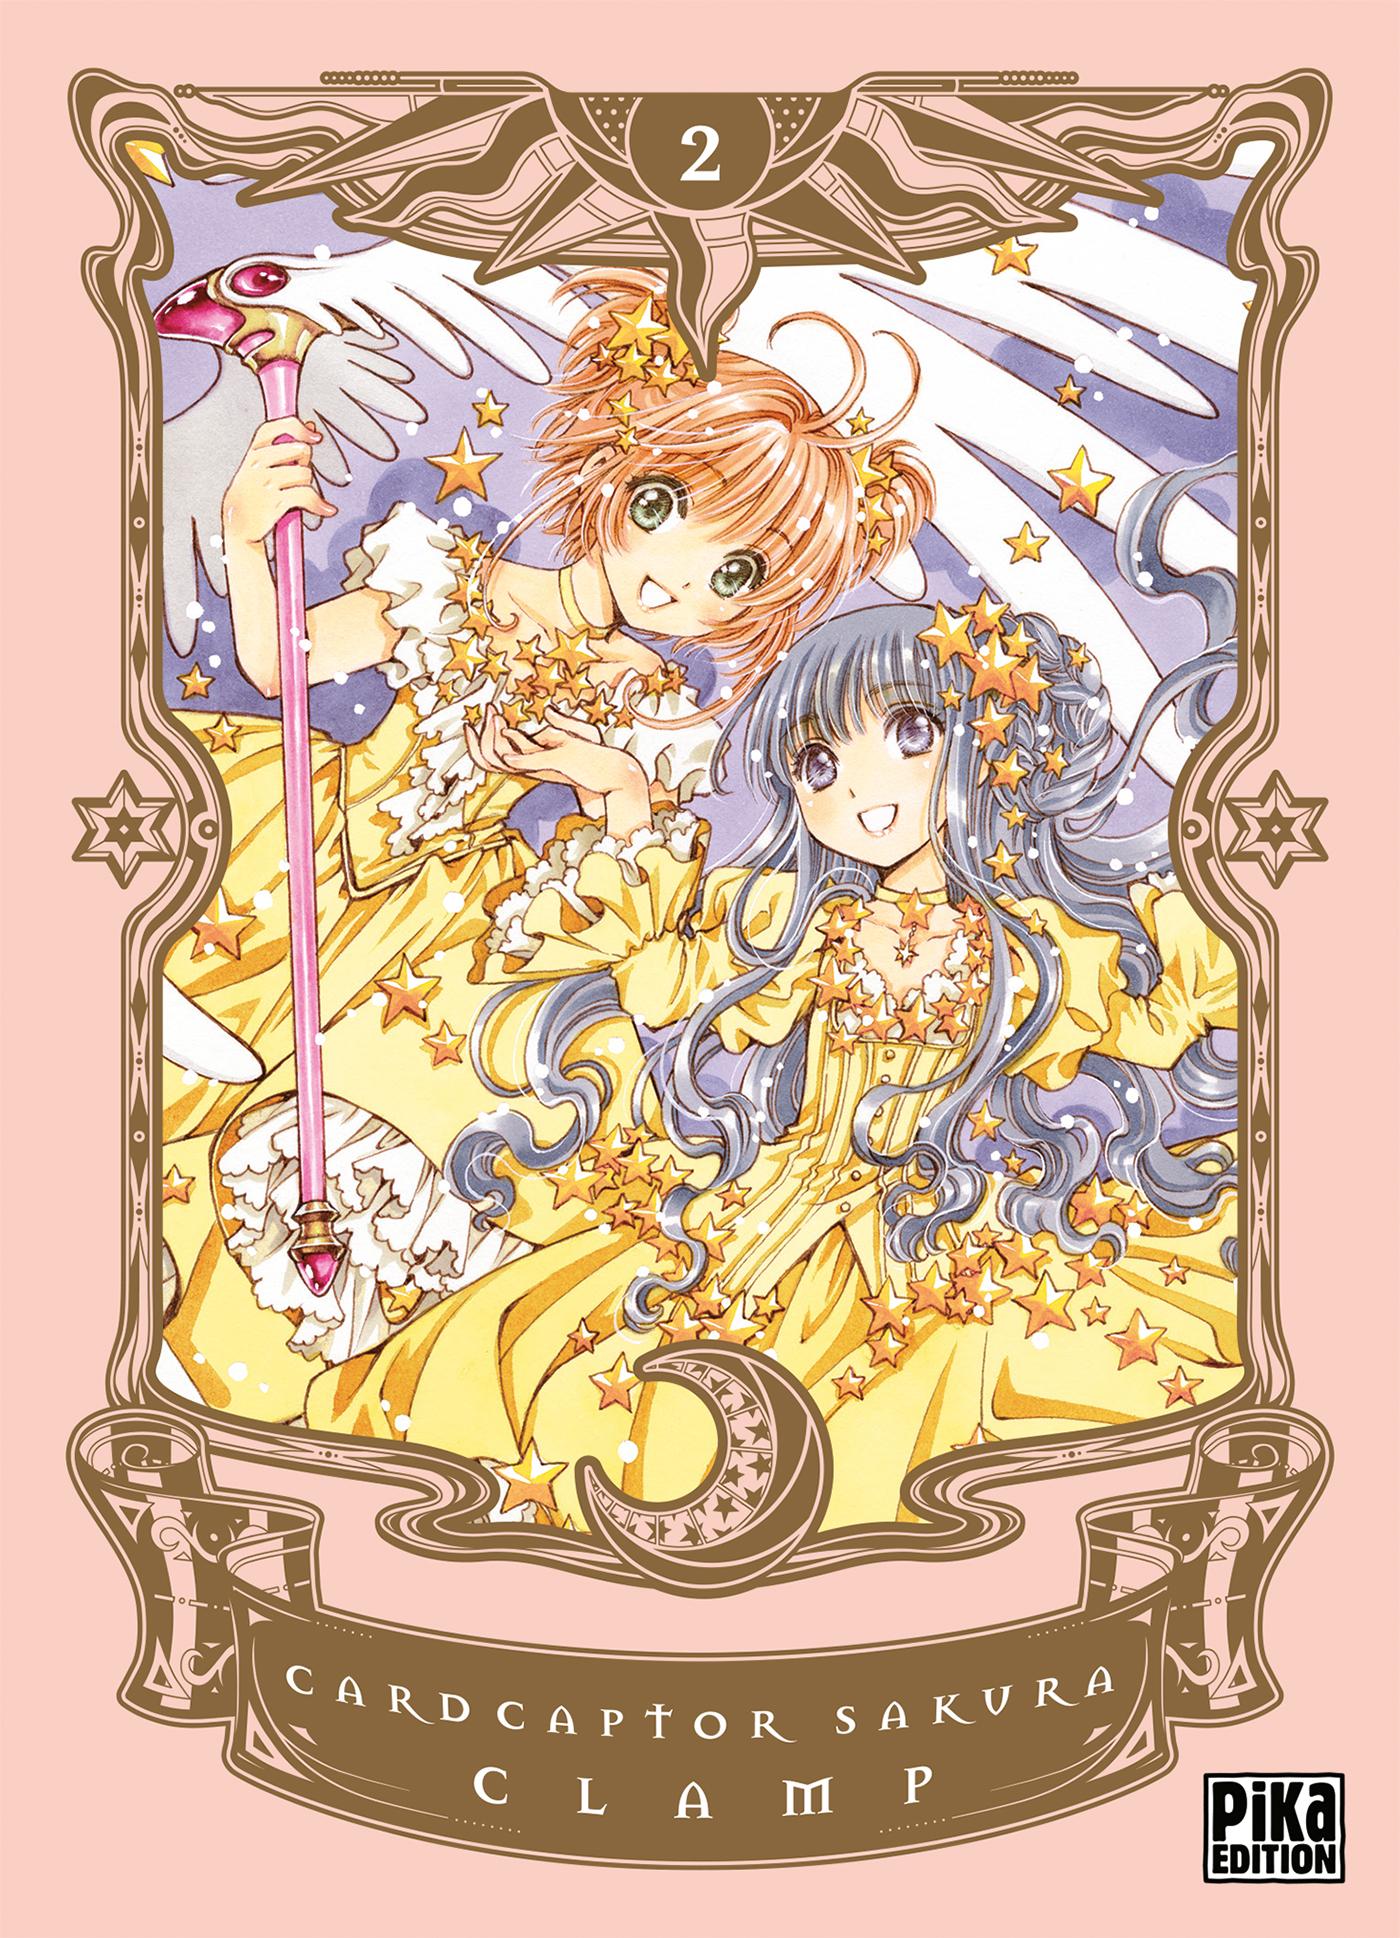 Vos achats d'otaku et vos achats ... d'otaku ! - Page 20 Card-captor-sakura-manga-volume-2-edition-2017-242525